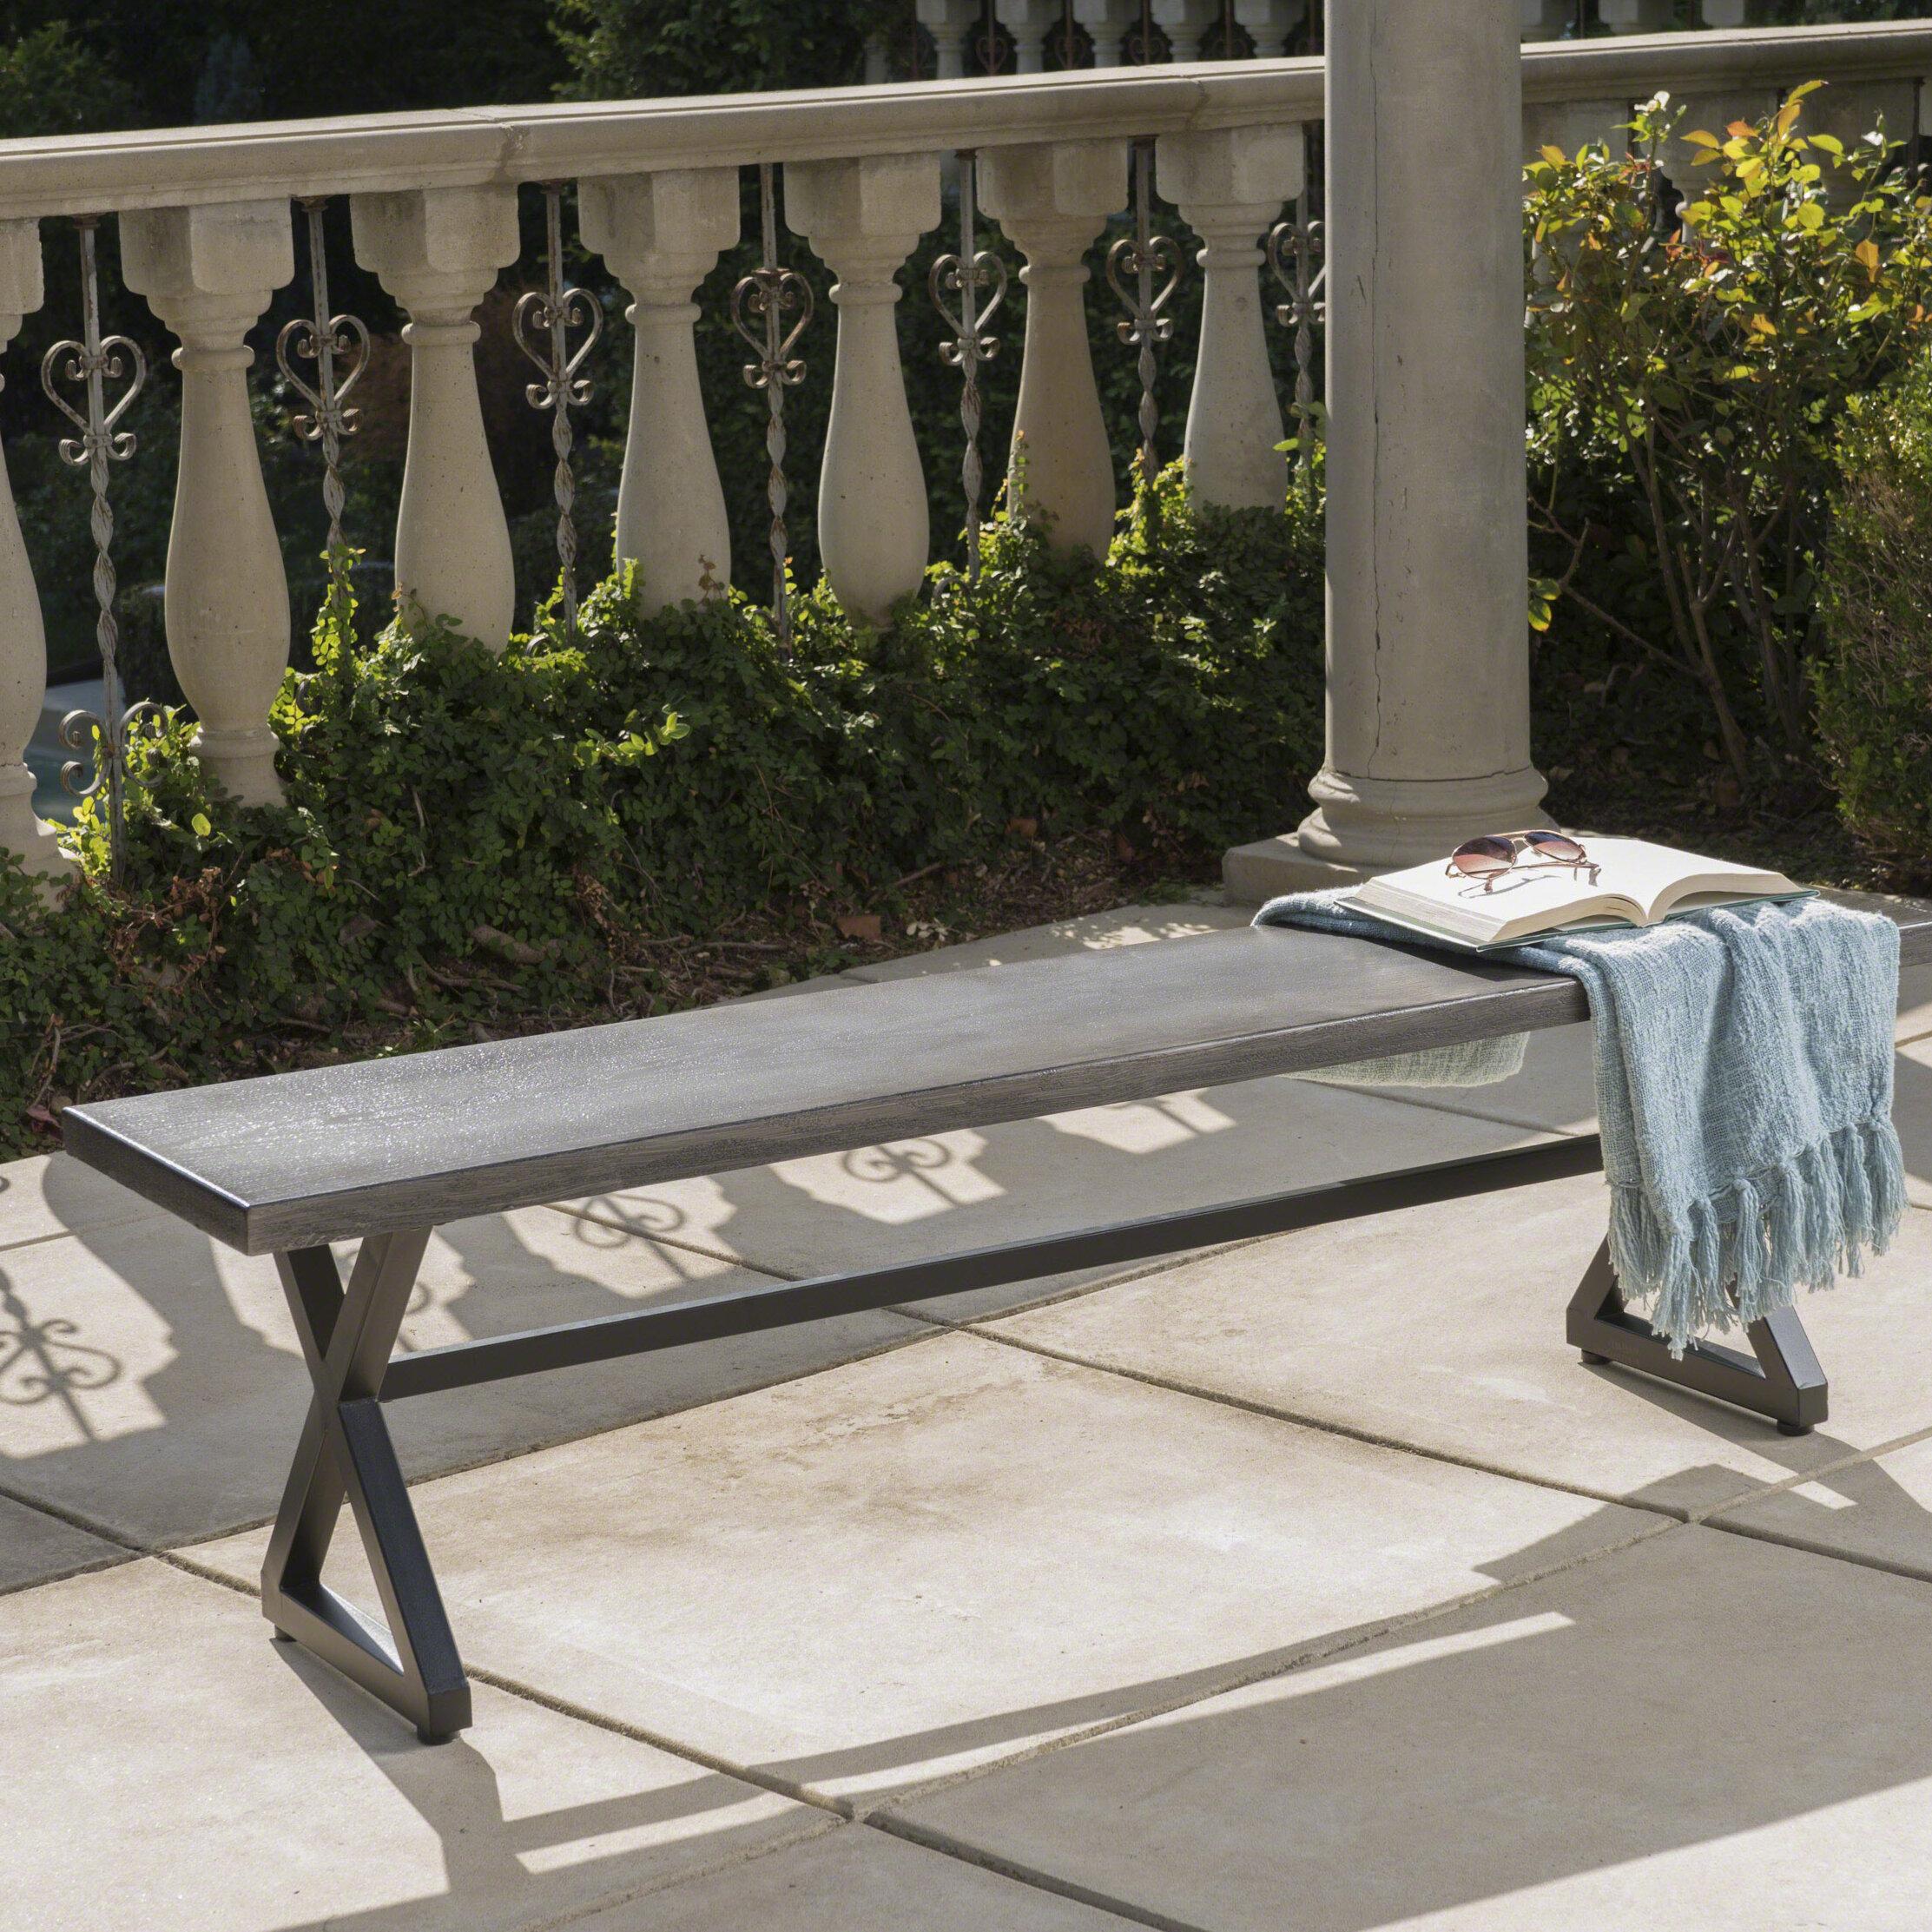 Pleasing Union Rustic Bohra Outdoor Aluminum Picnic Bench Reviews Evergreenethics Interior Chair Design Evergreenethicsorg